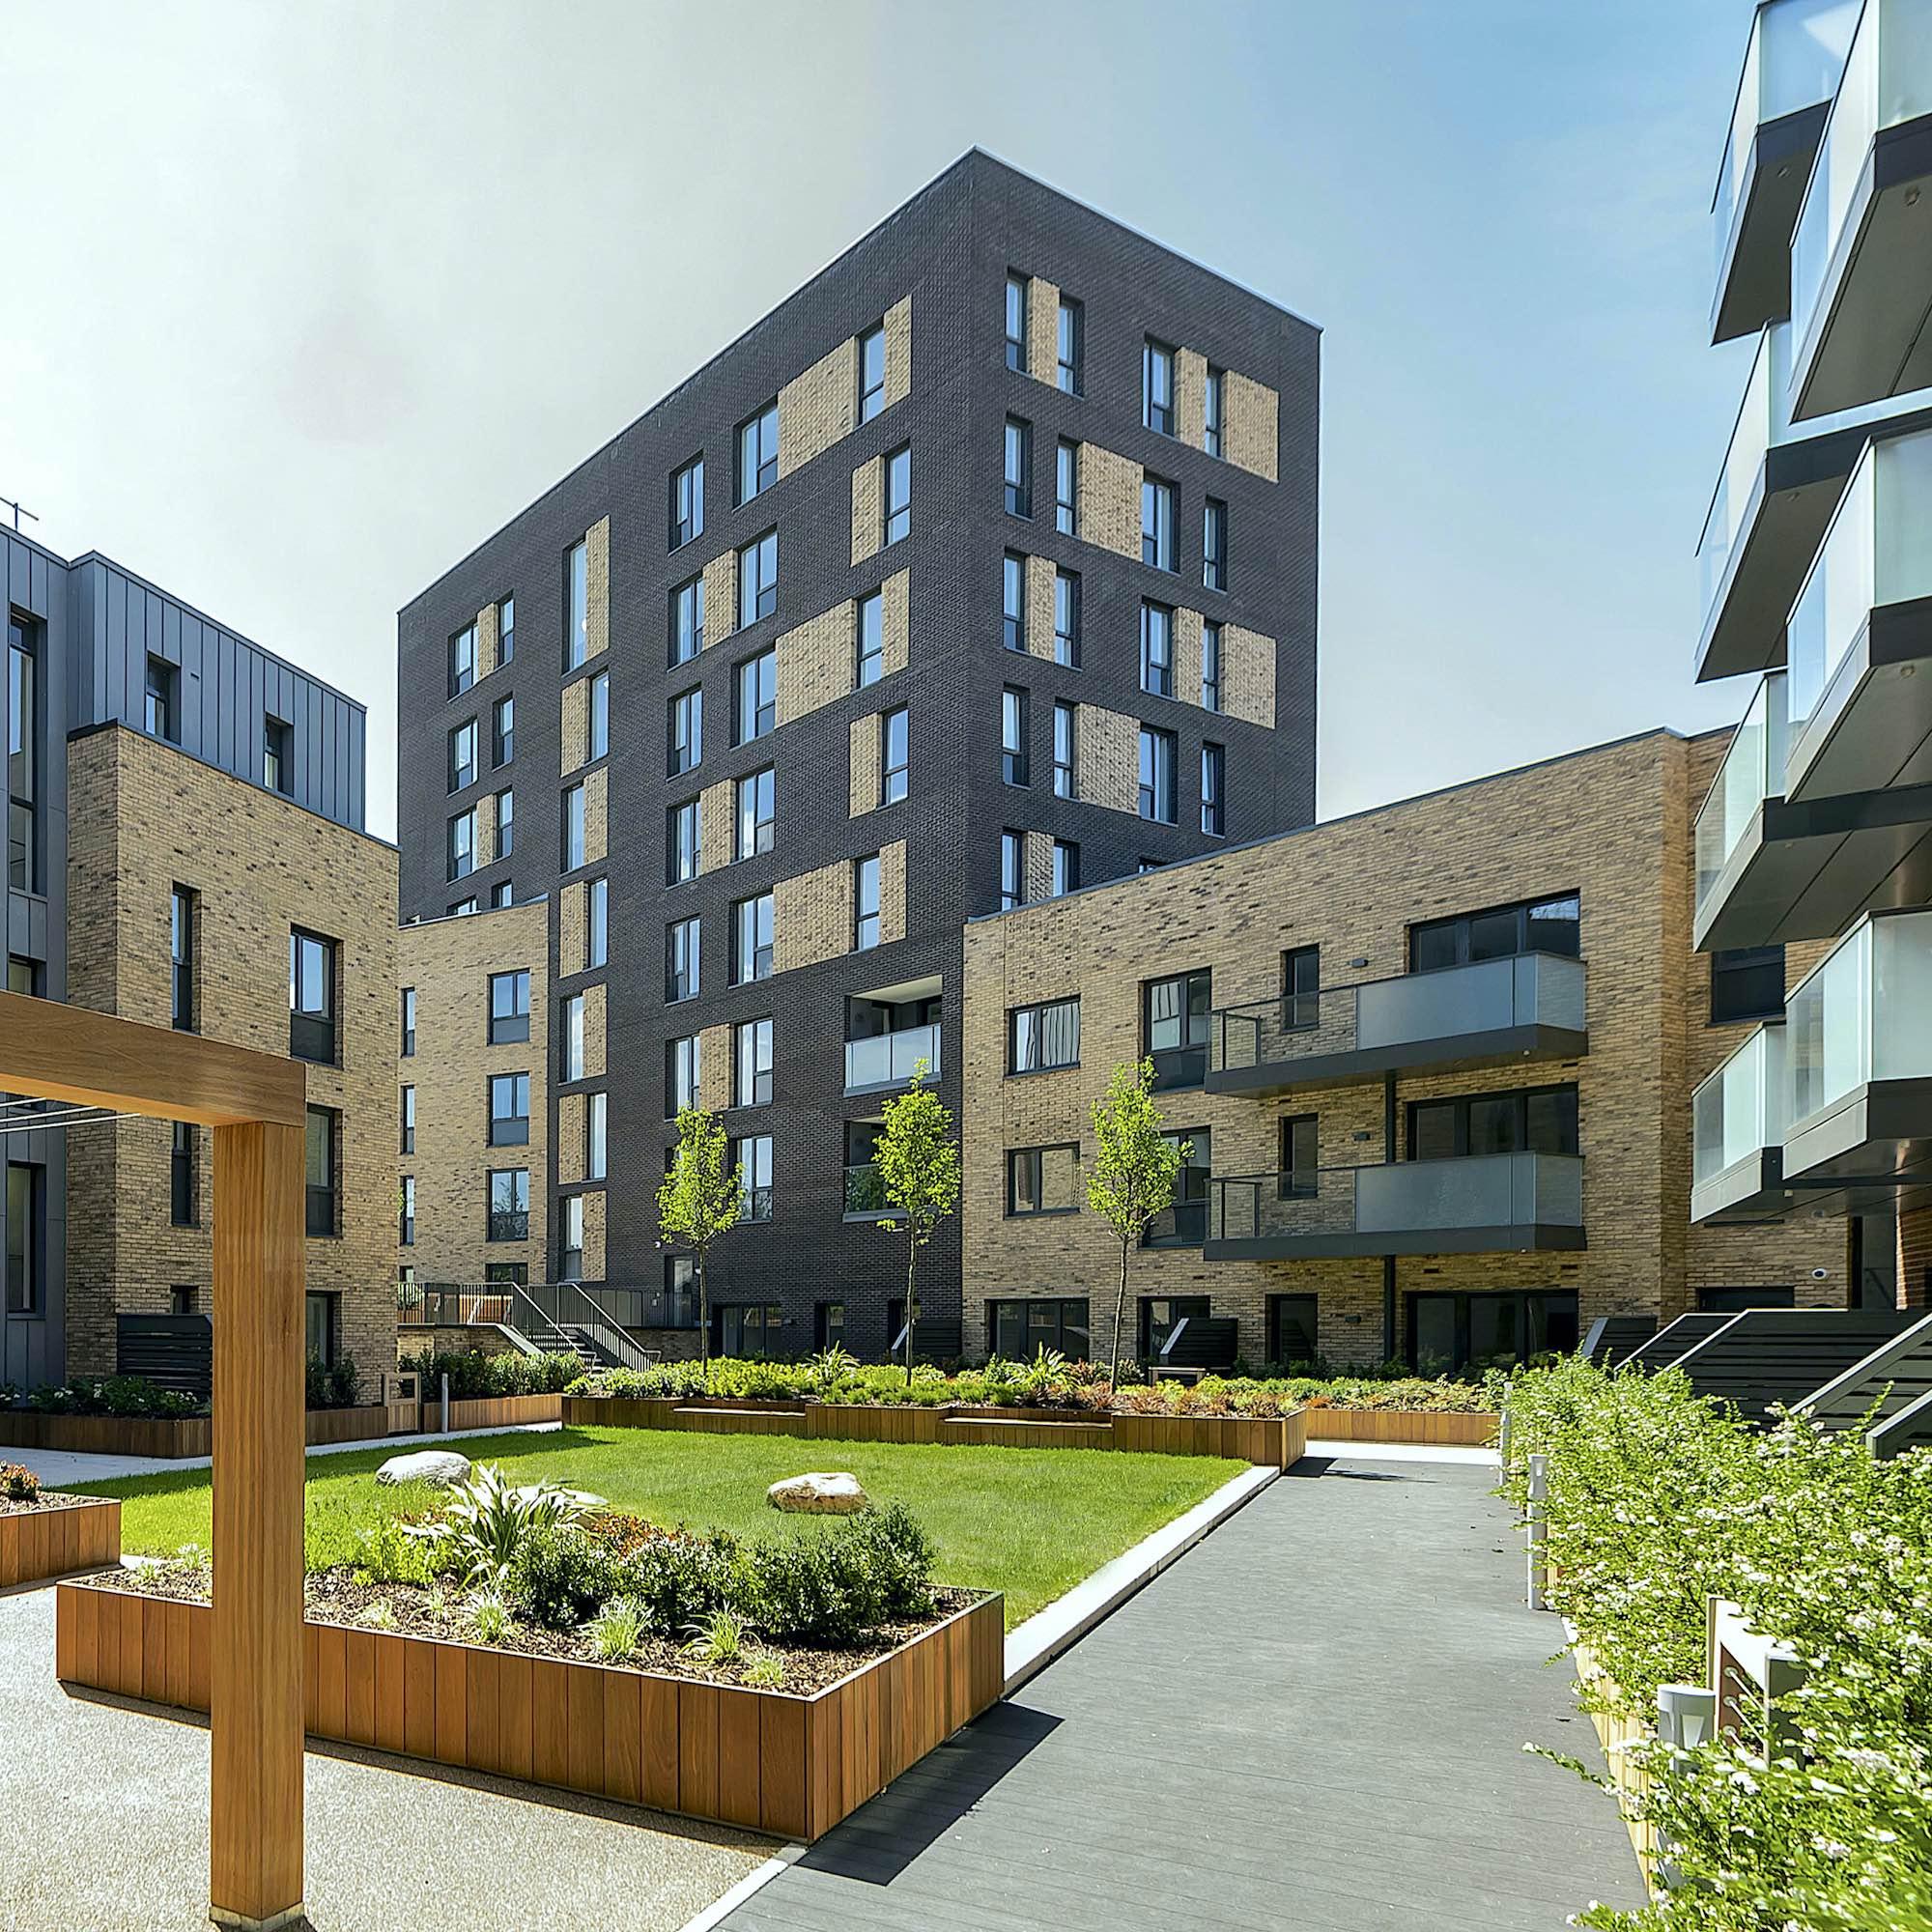 Peckham Place / Wooddene Estate, Peckham